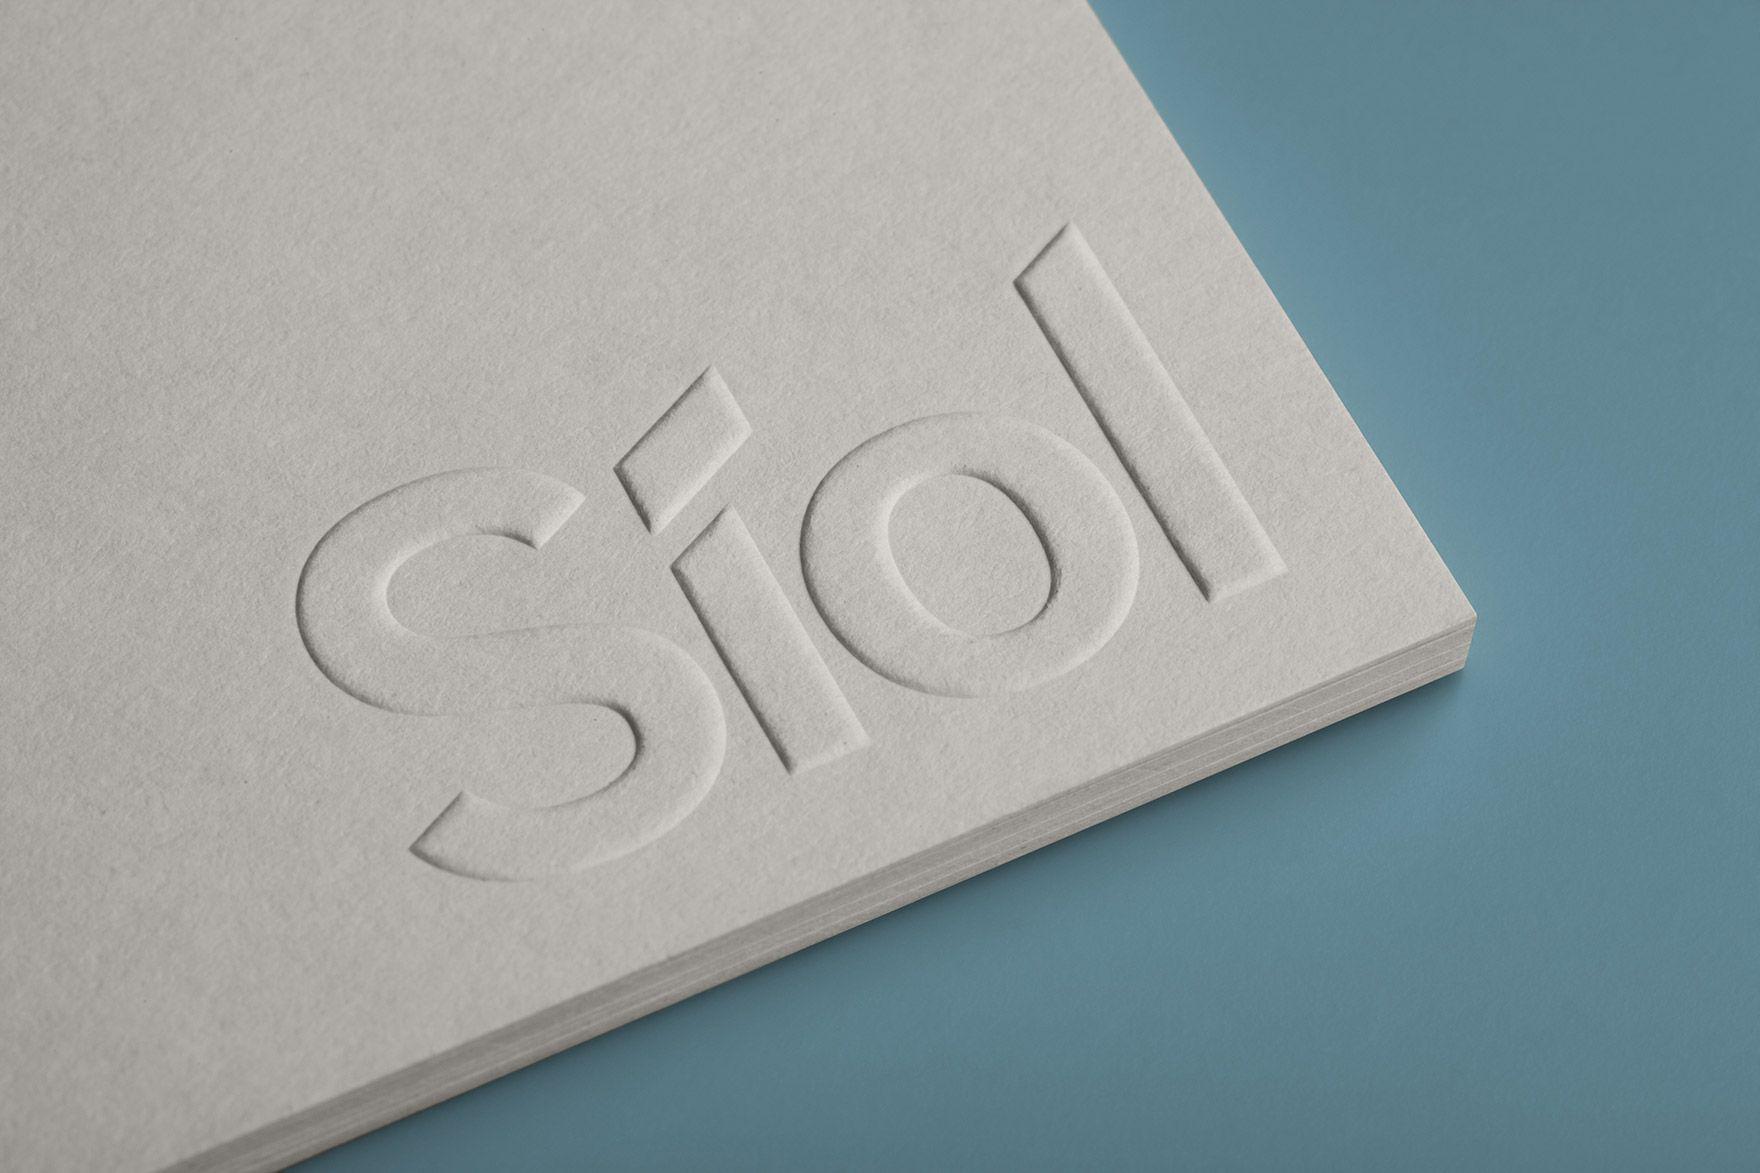 síol pinterest stationary printed materials and logo branding